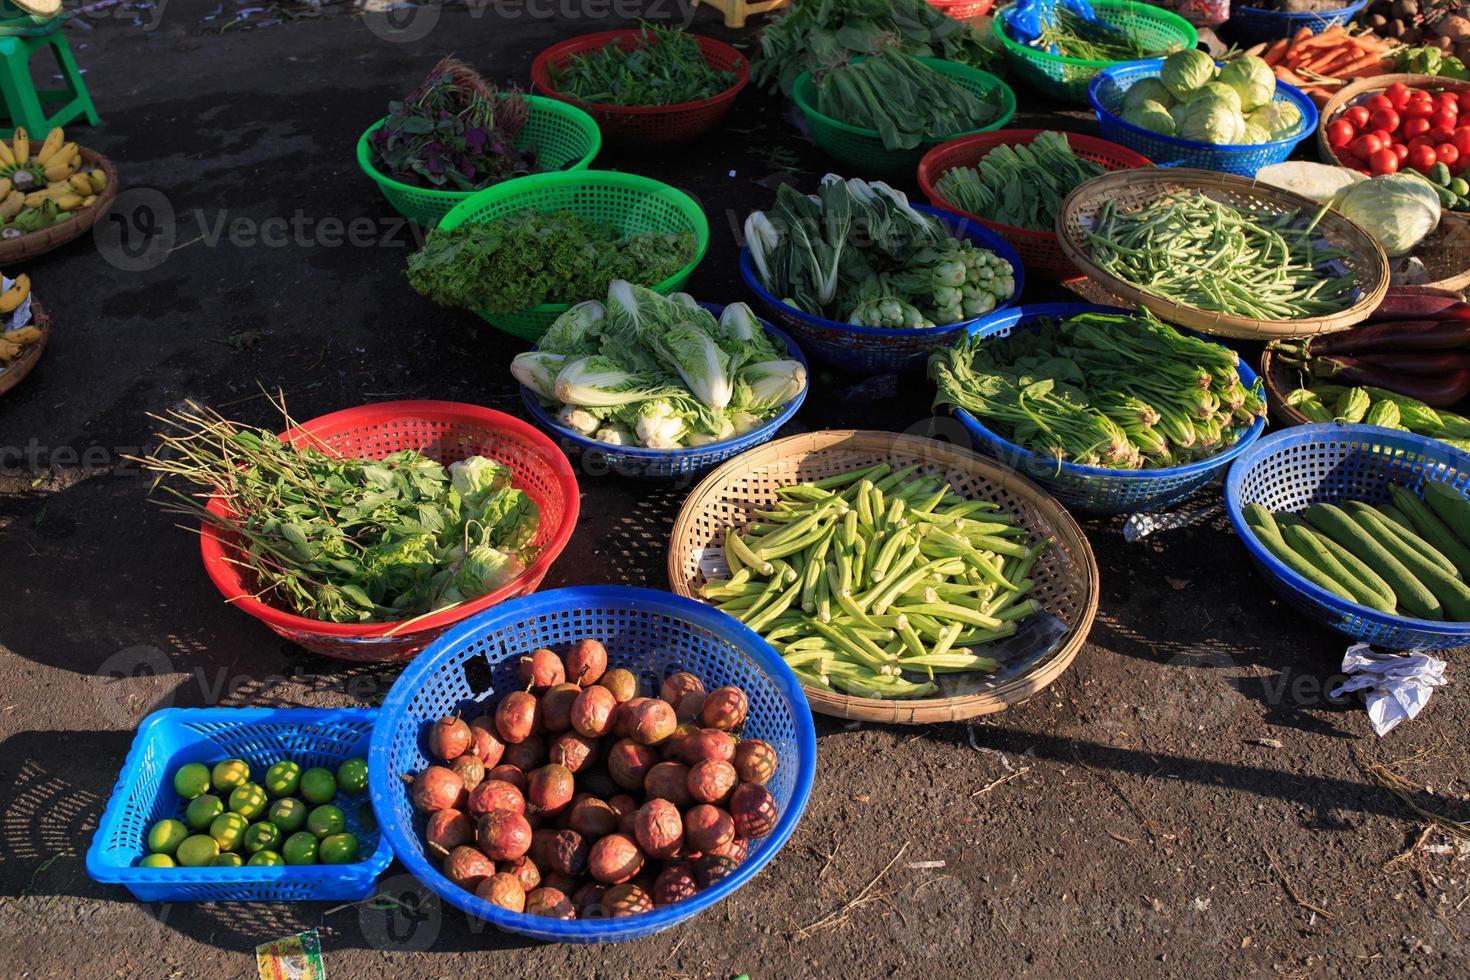 legumes e frutas no hoa binh, rua do mercado. foto